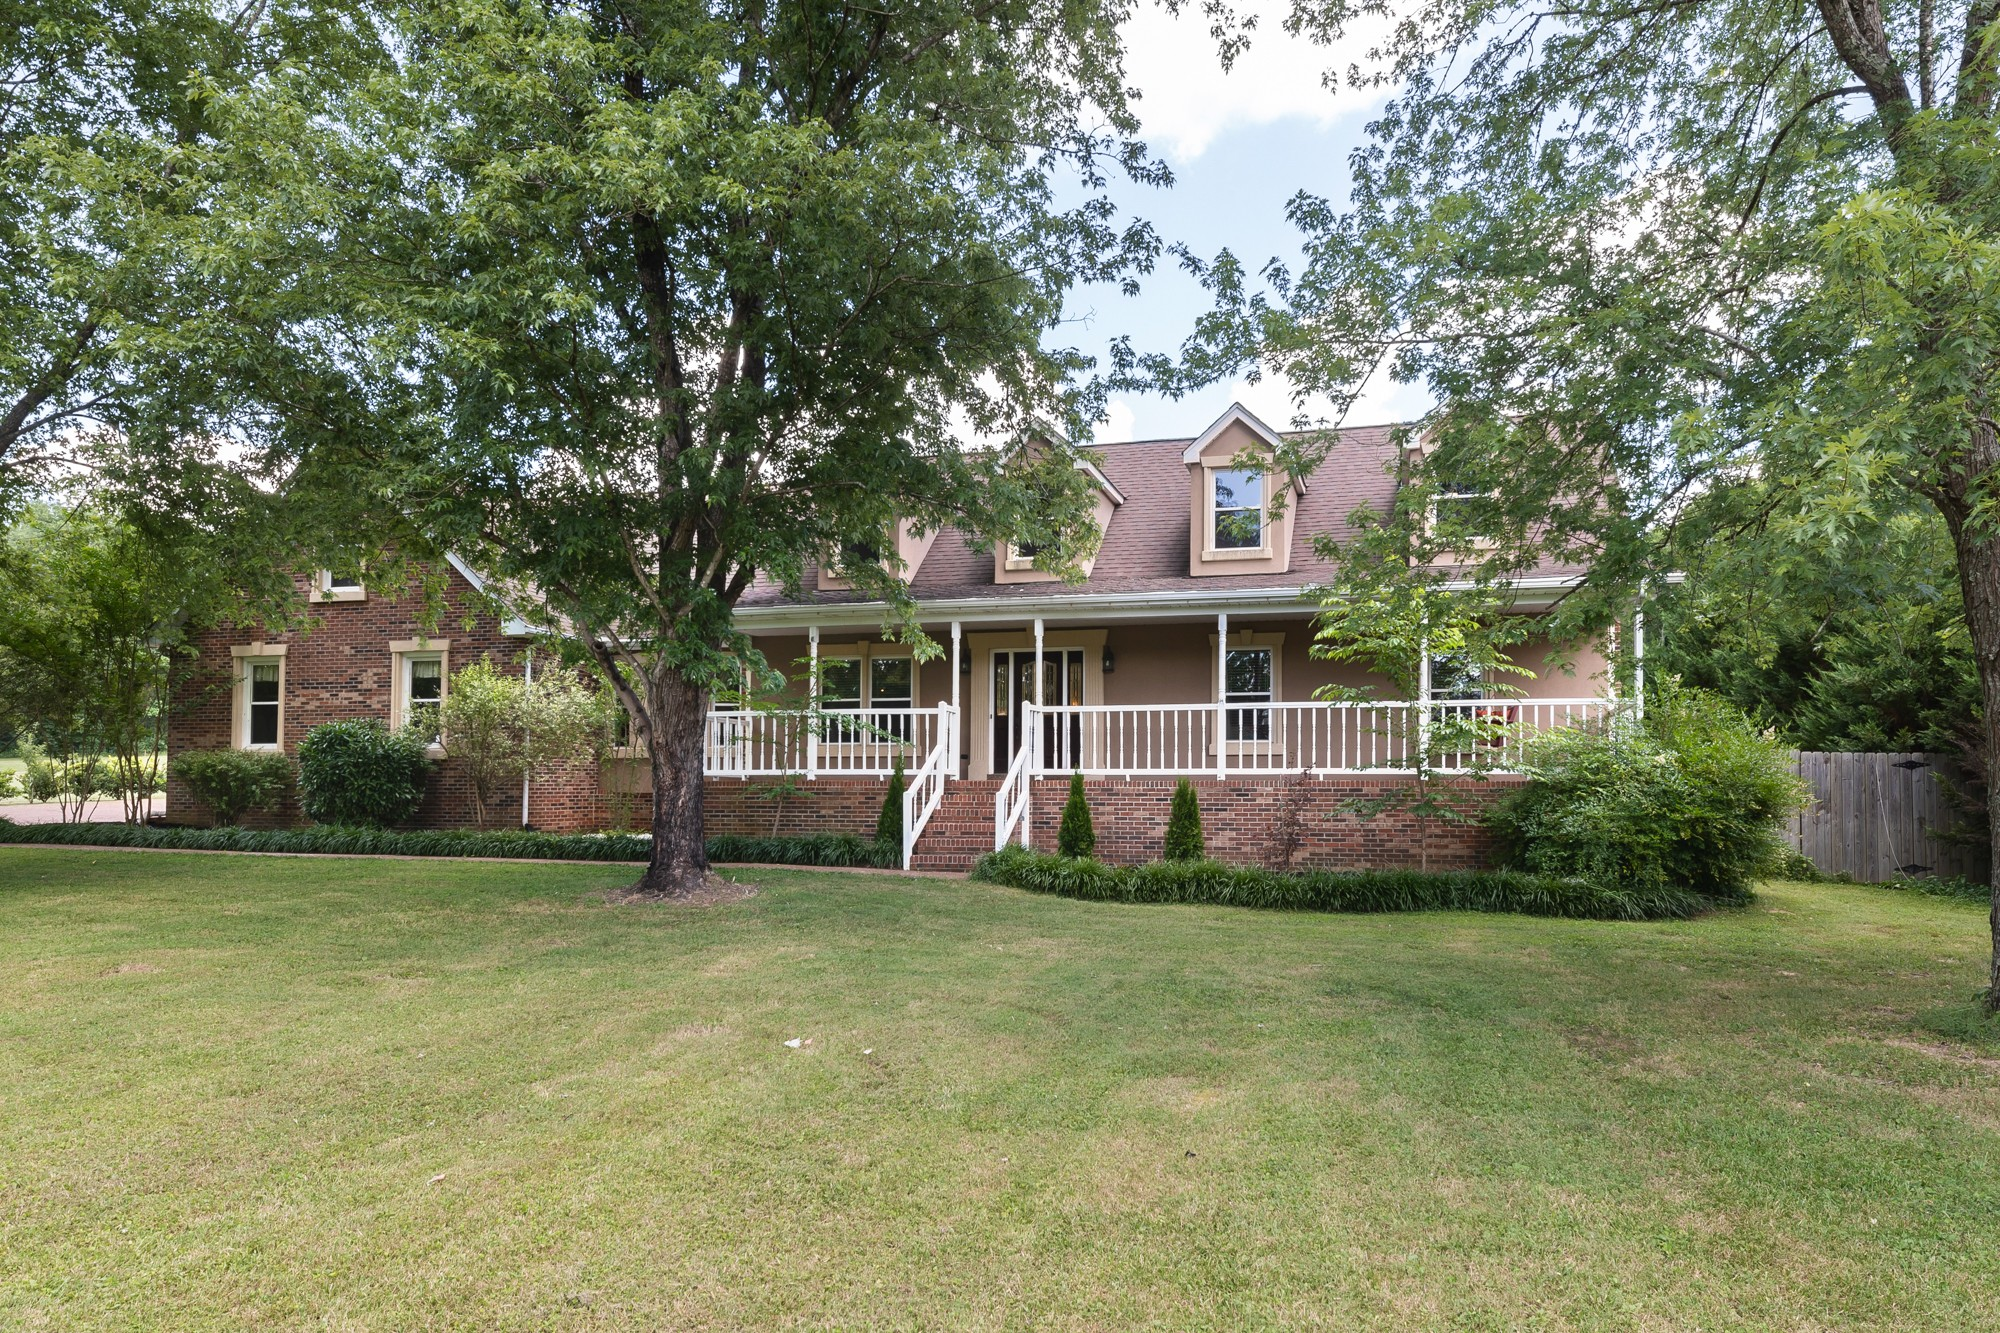 1152 Madison Creek Rd Property Photo - Goodlettsville, TN real estate listing